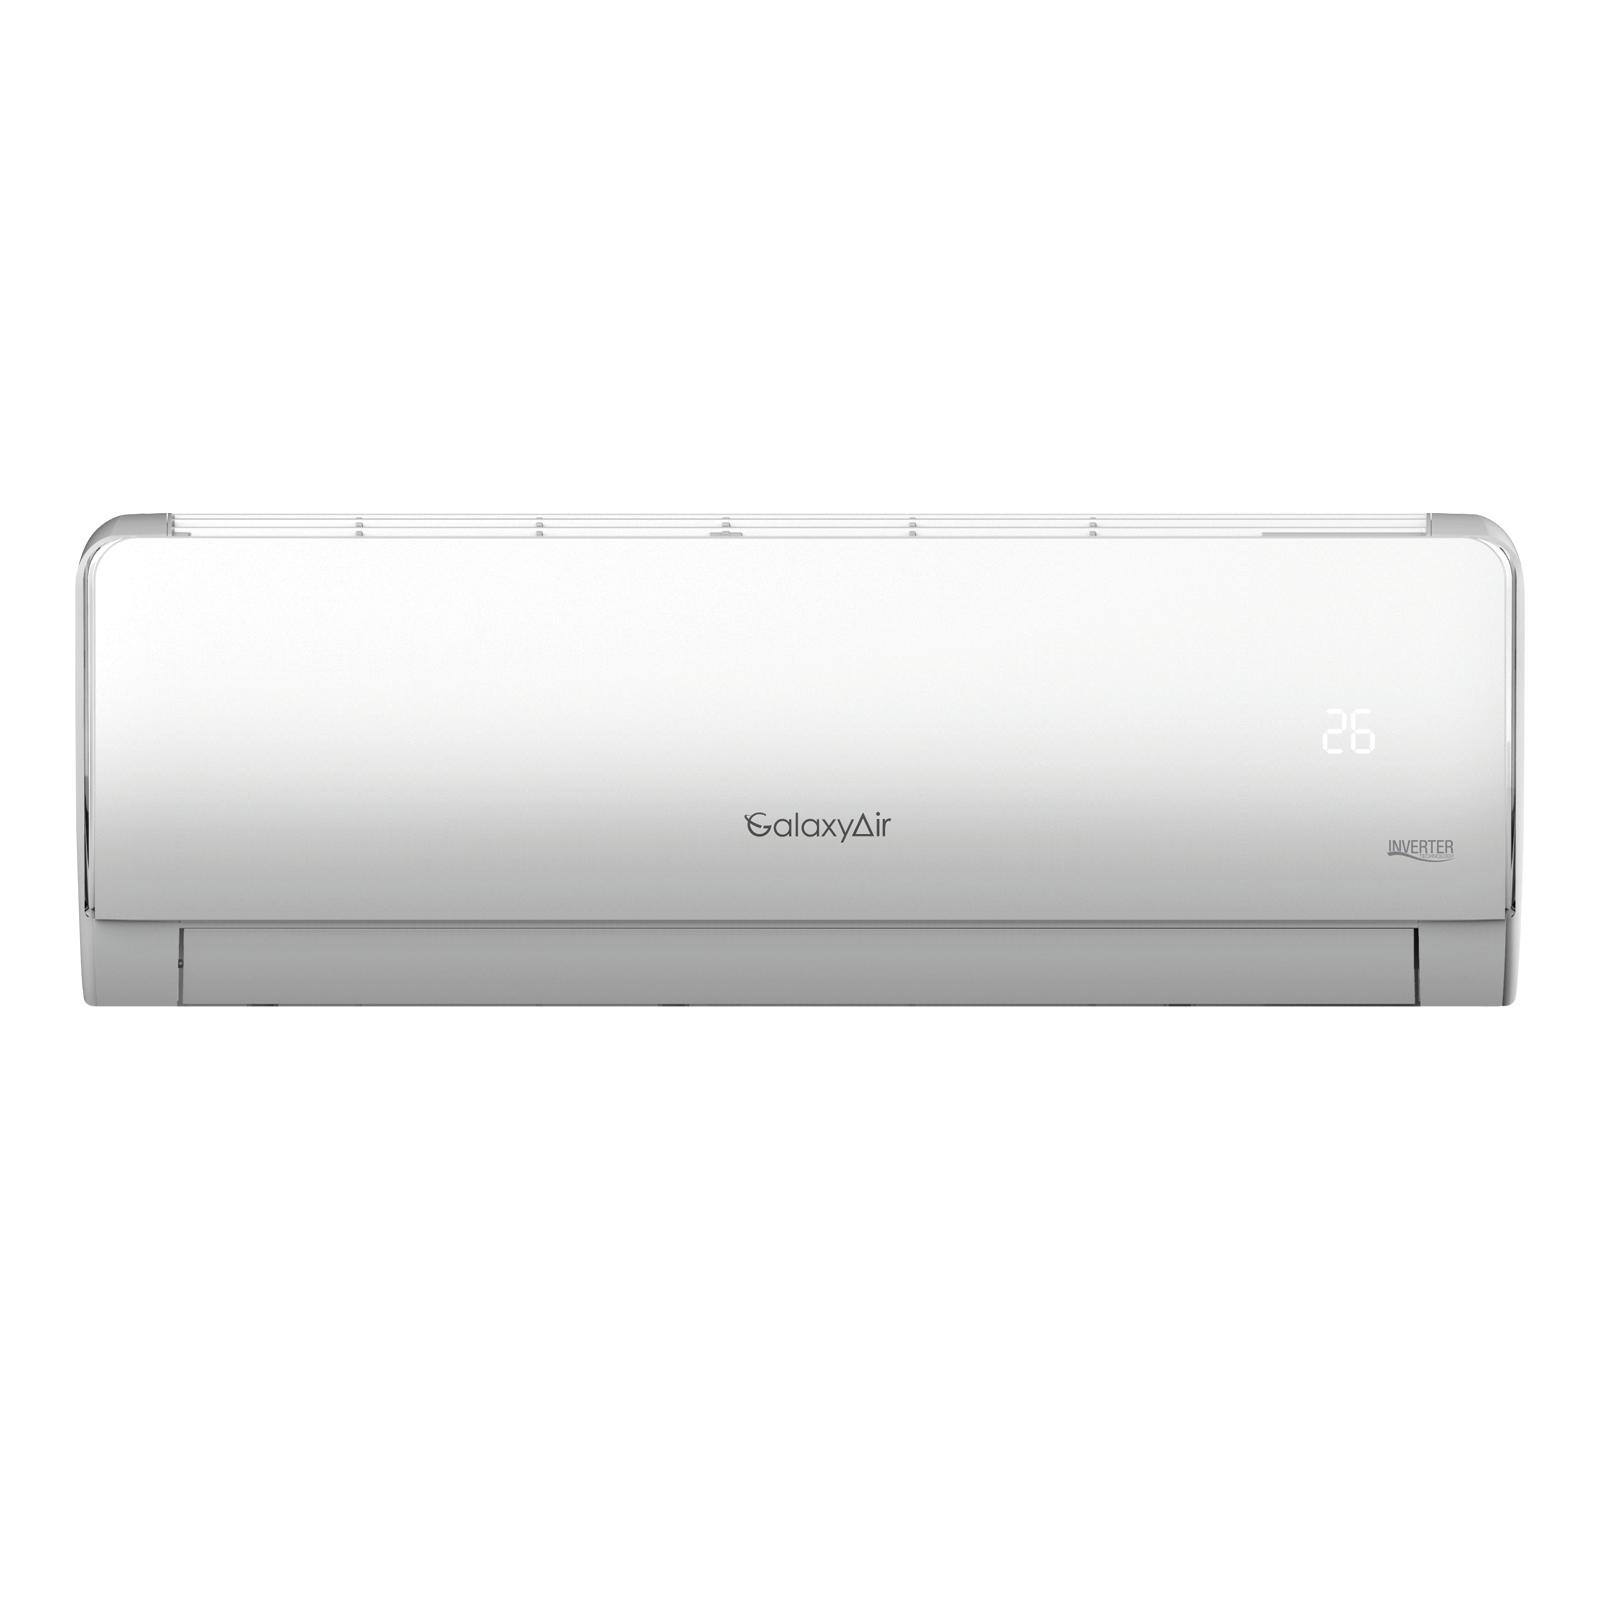 Galaxy Air 2.5KW Inverter Split System Air Conditioner